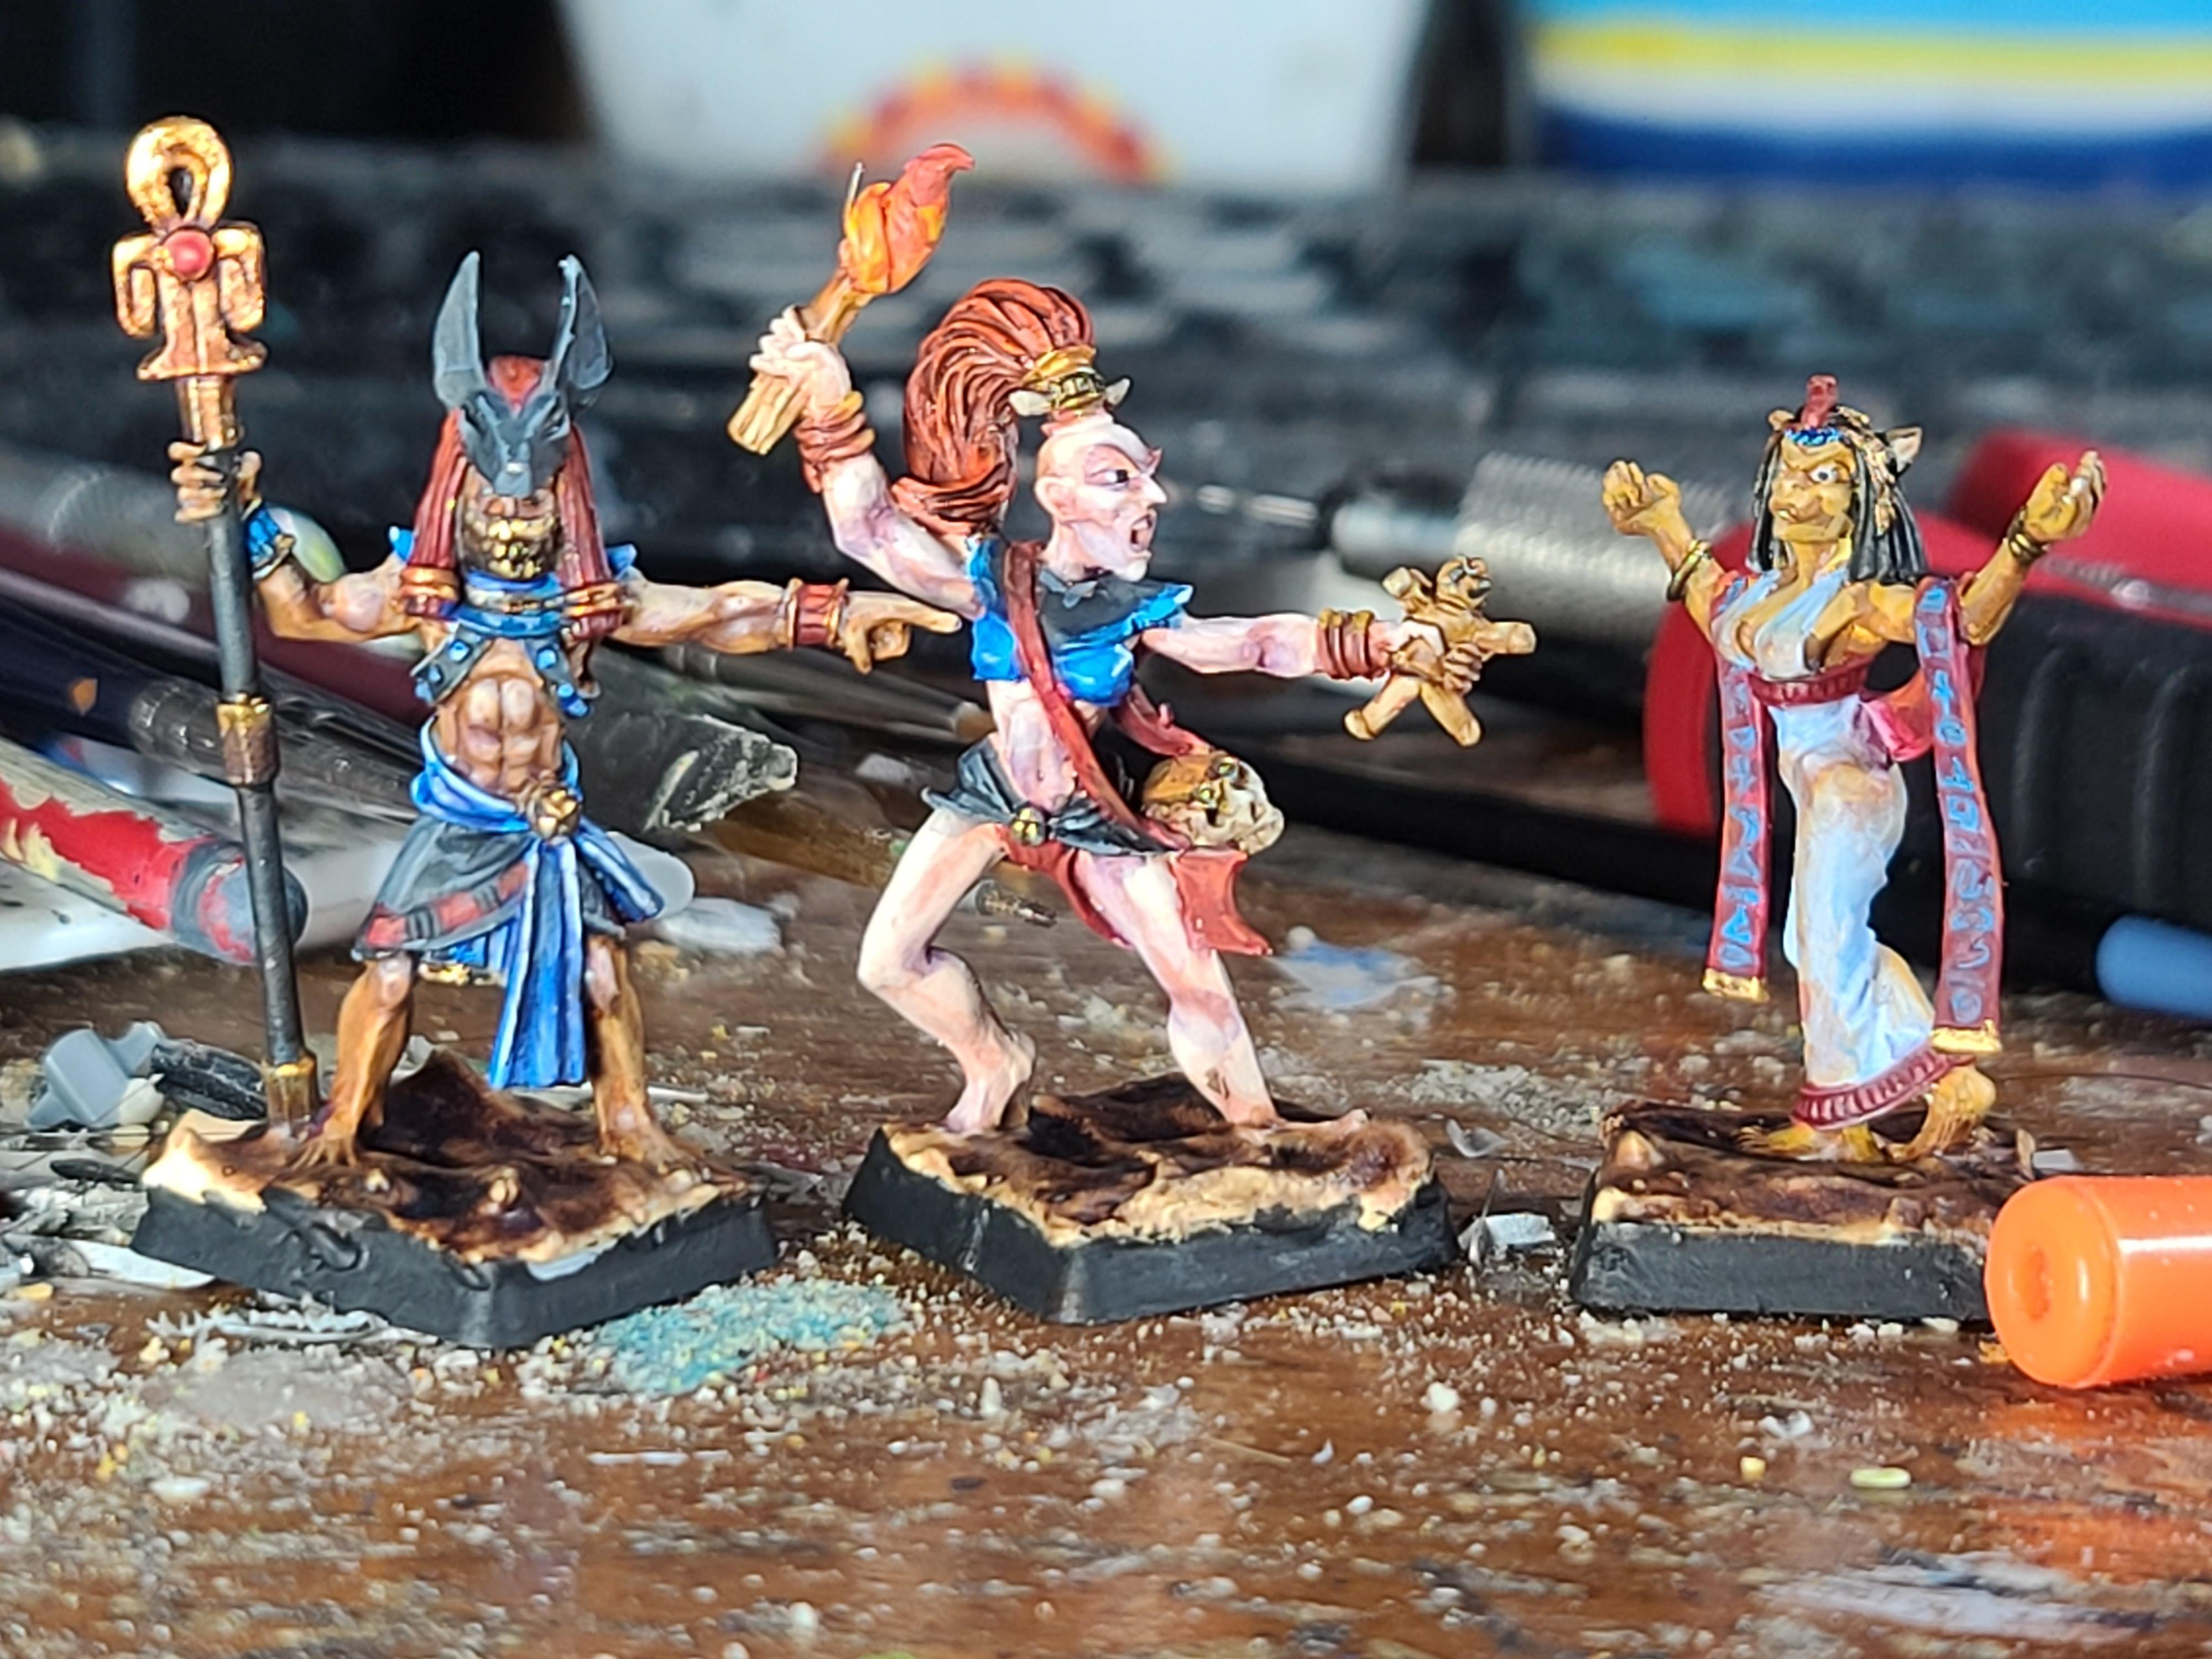 Aegyptus, Asar, Basti, Catgirl, Crocodile Games, Human, Preists, War Gods